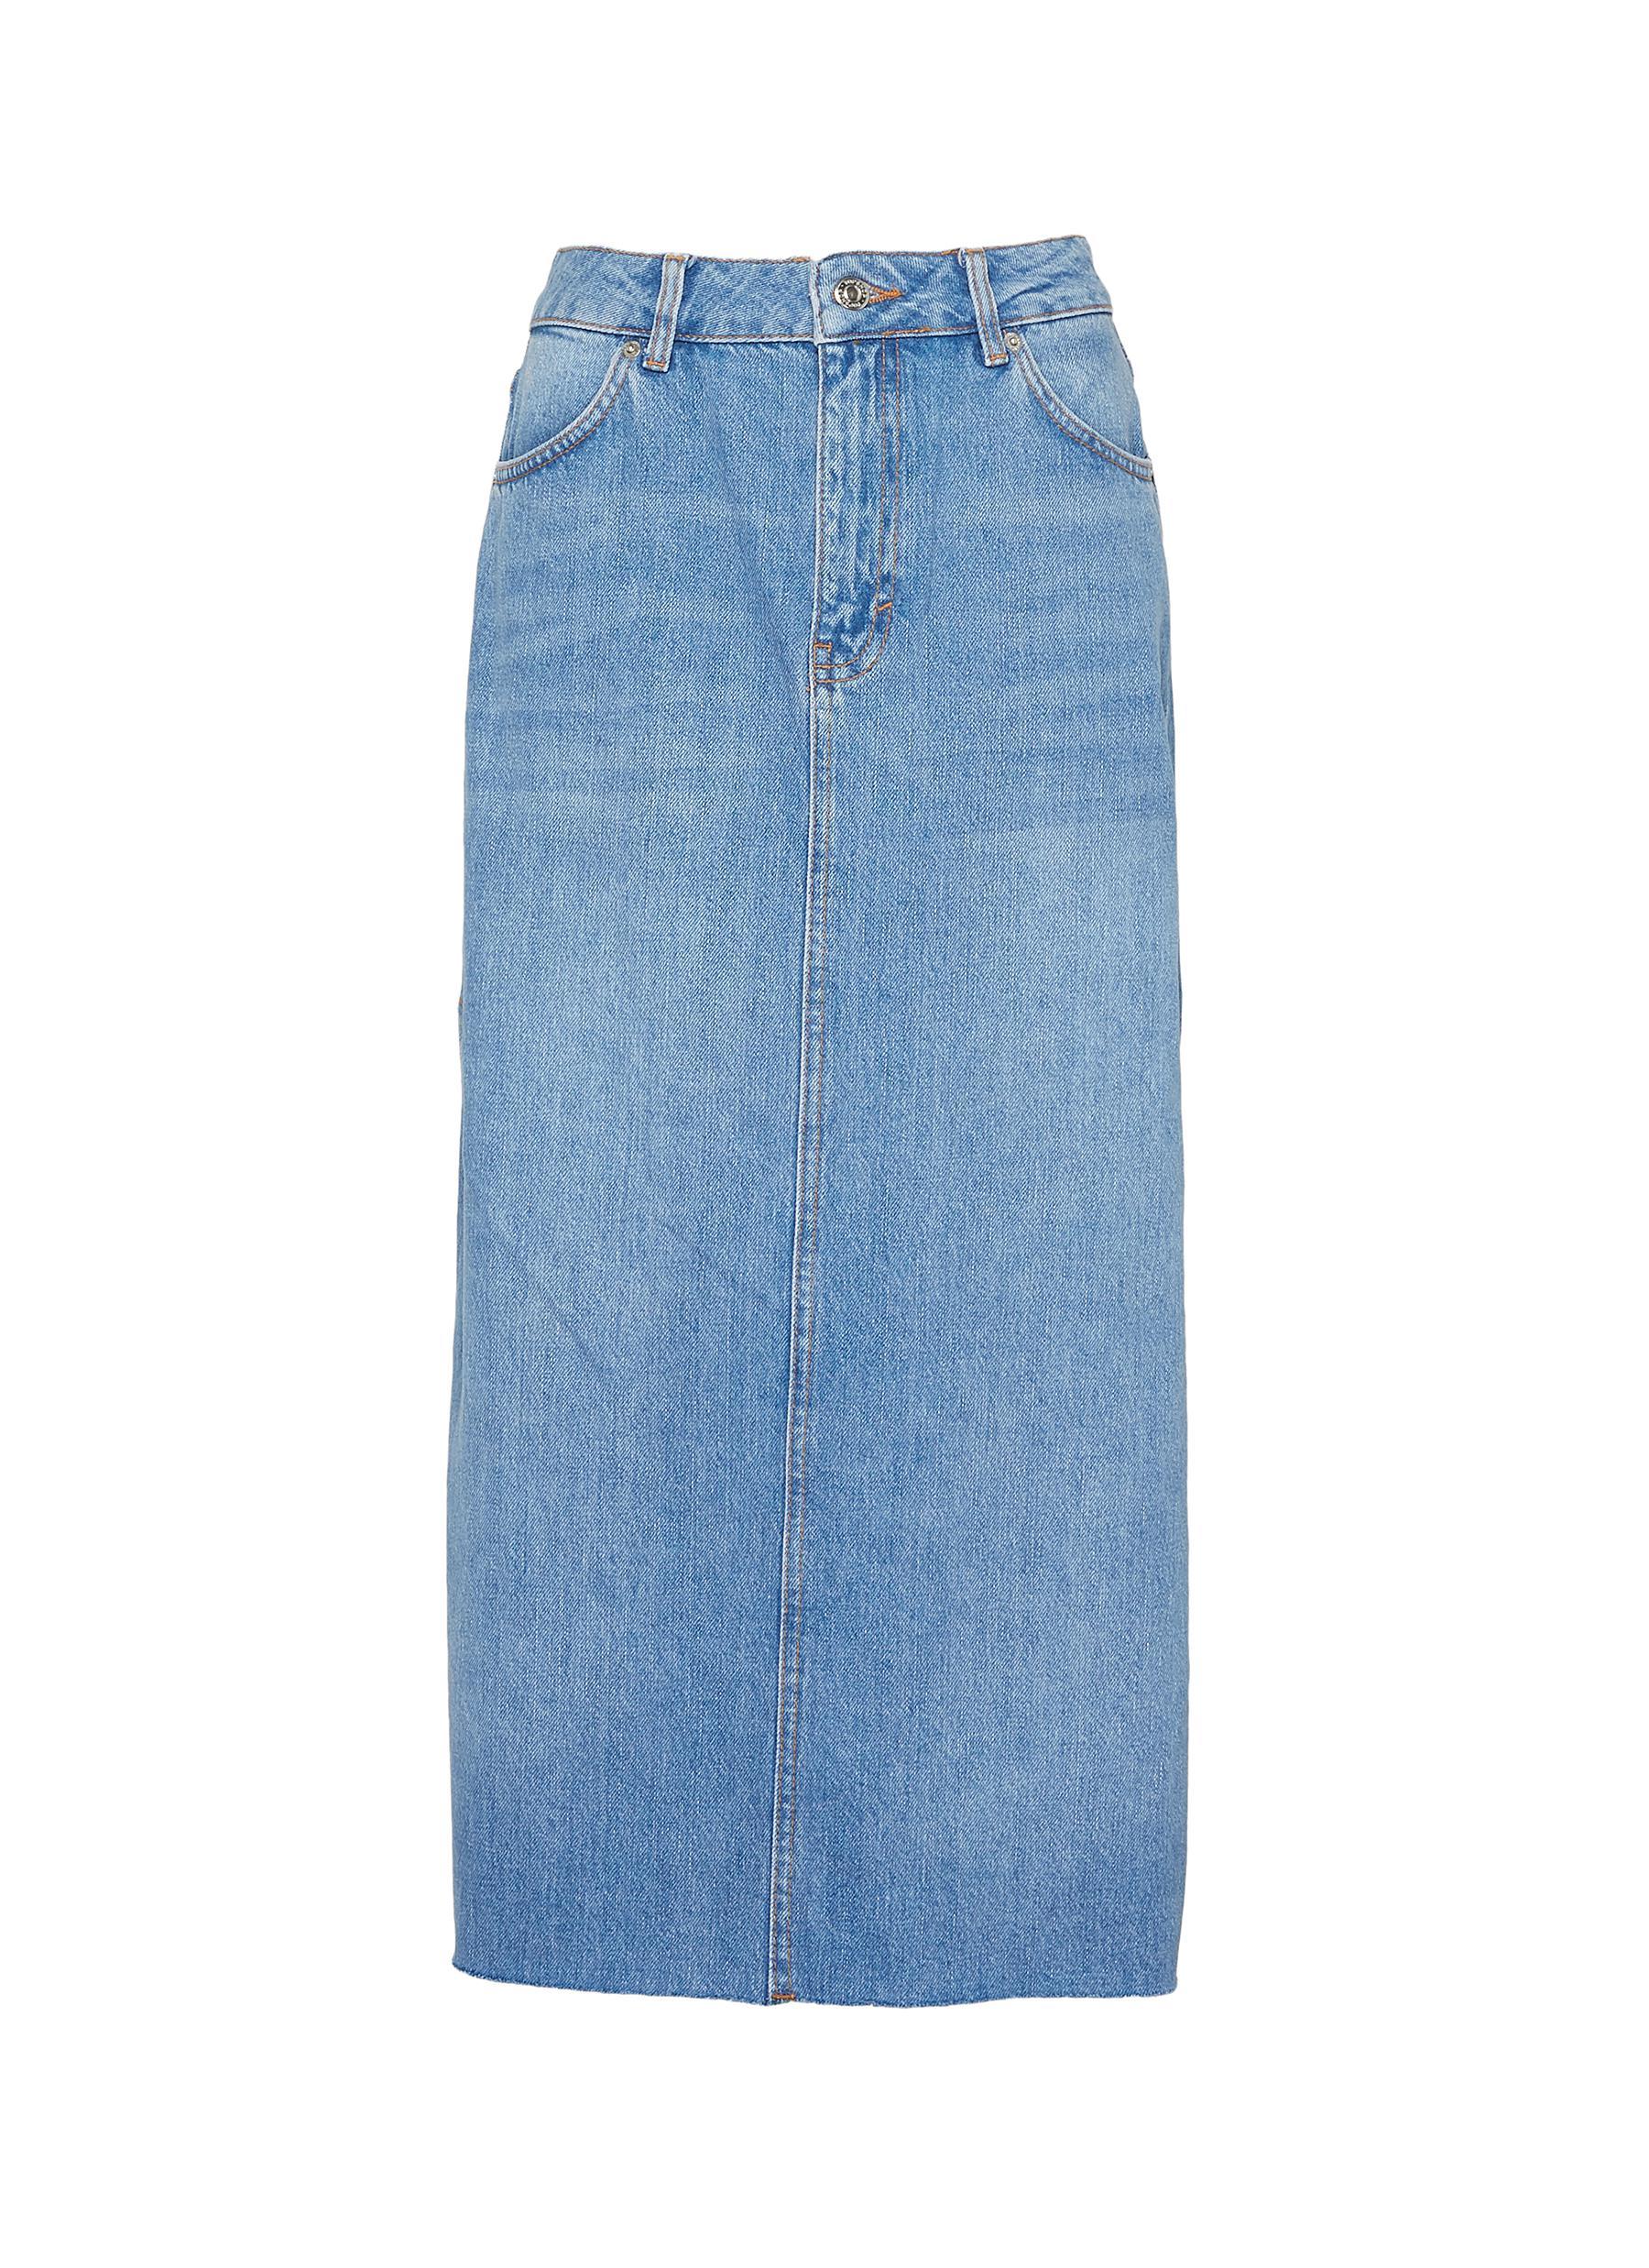 4120cbe922 Main View - Click To Enlarge - Topshop - Side split denim skirt